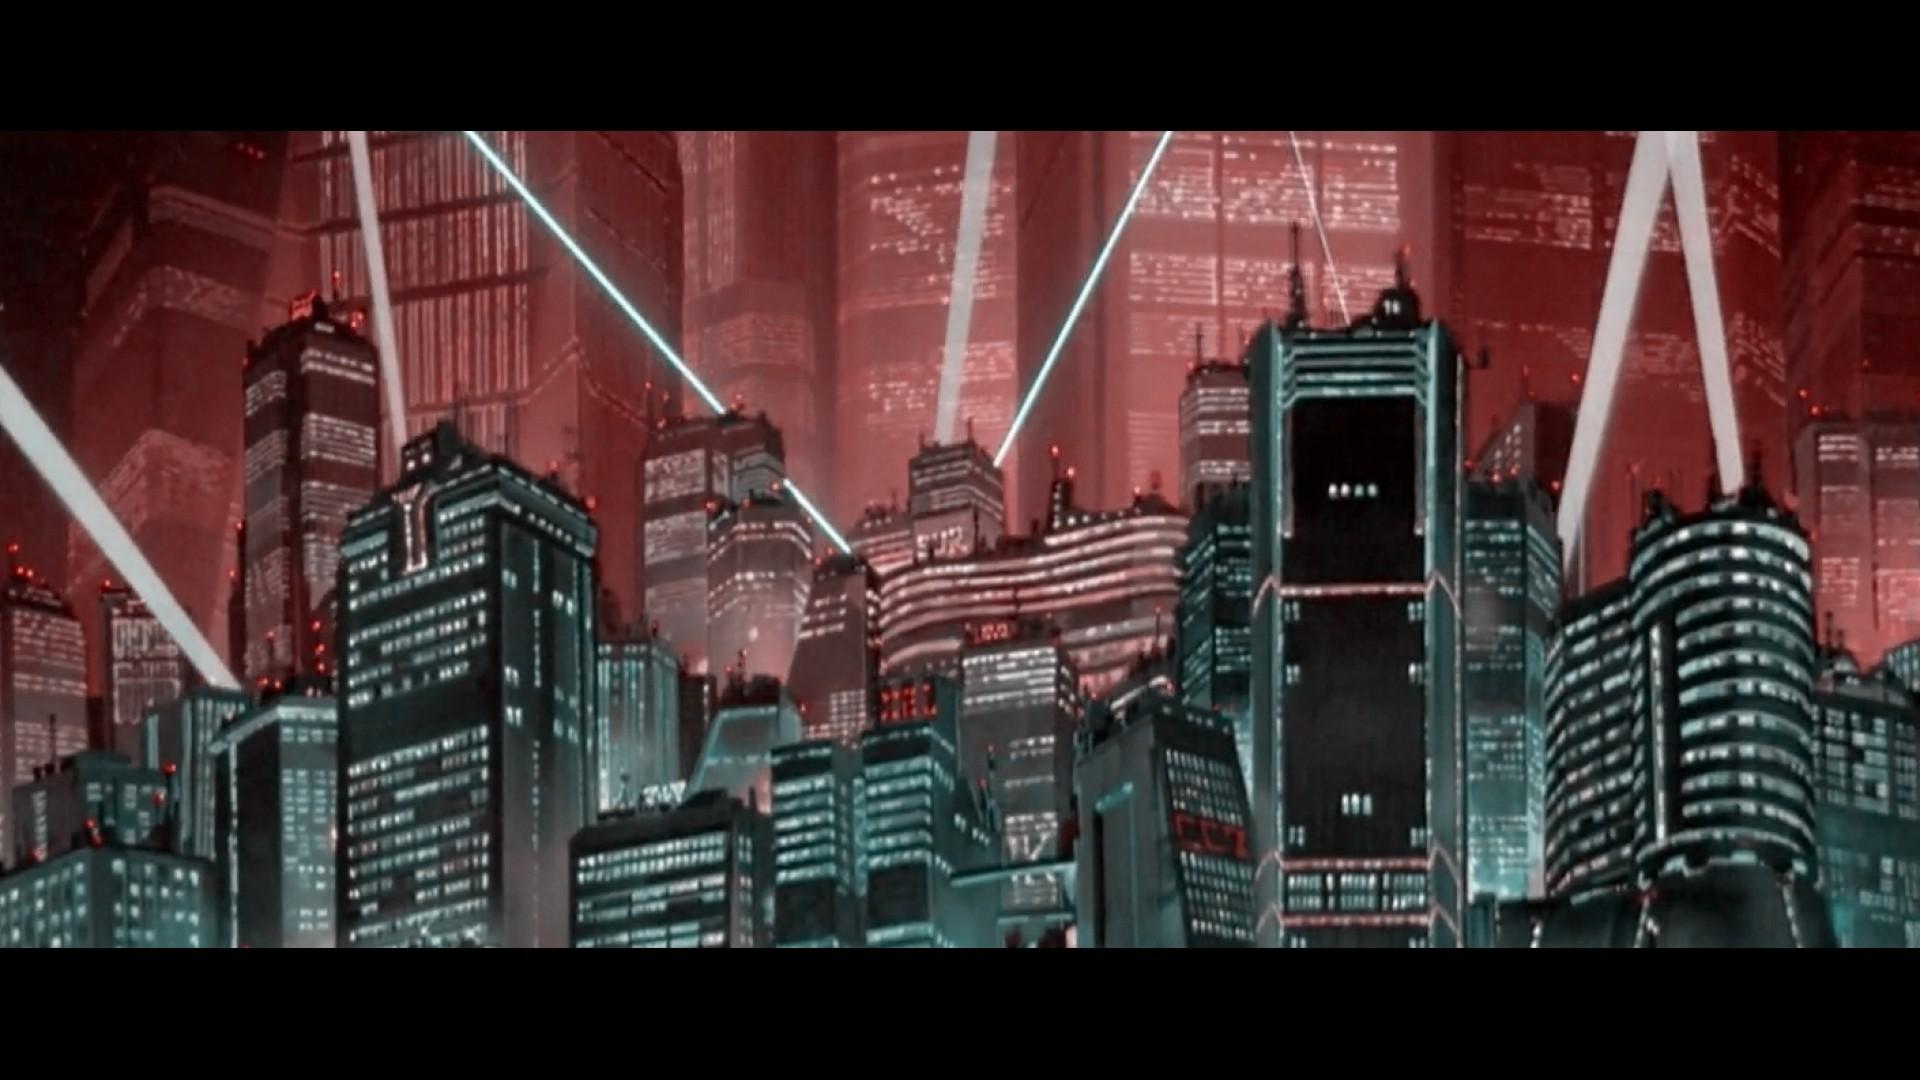 Hd Picture Neo Tokyo Akira 77927 Theiapolis Data Src Neo Tokyo Akira Movie Anime 1920x1080 Download Hd Wallpaper Wallpapertip